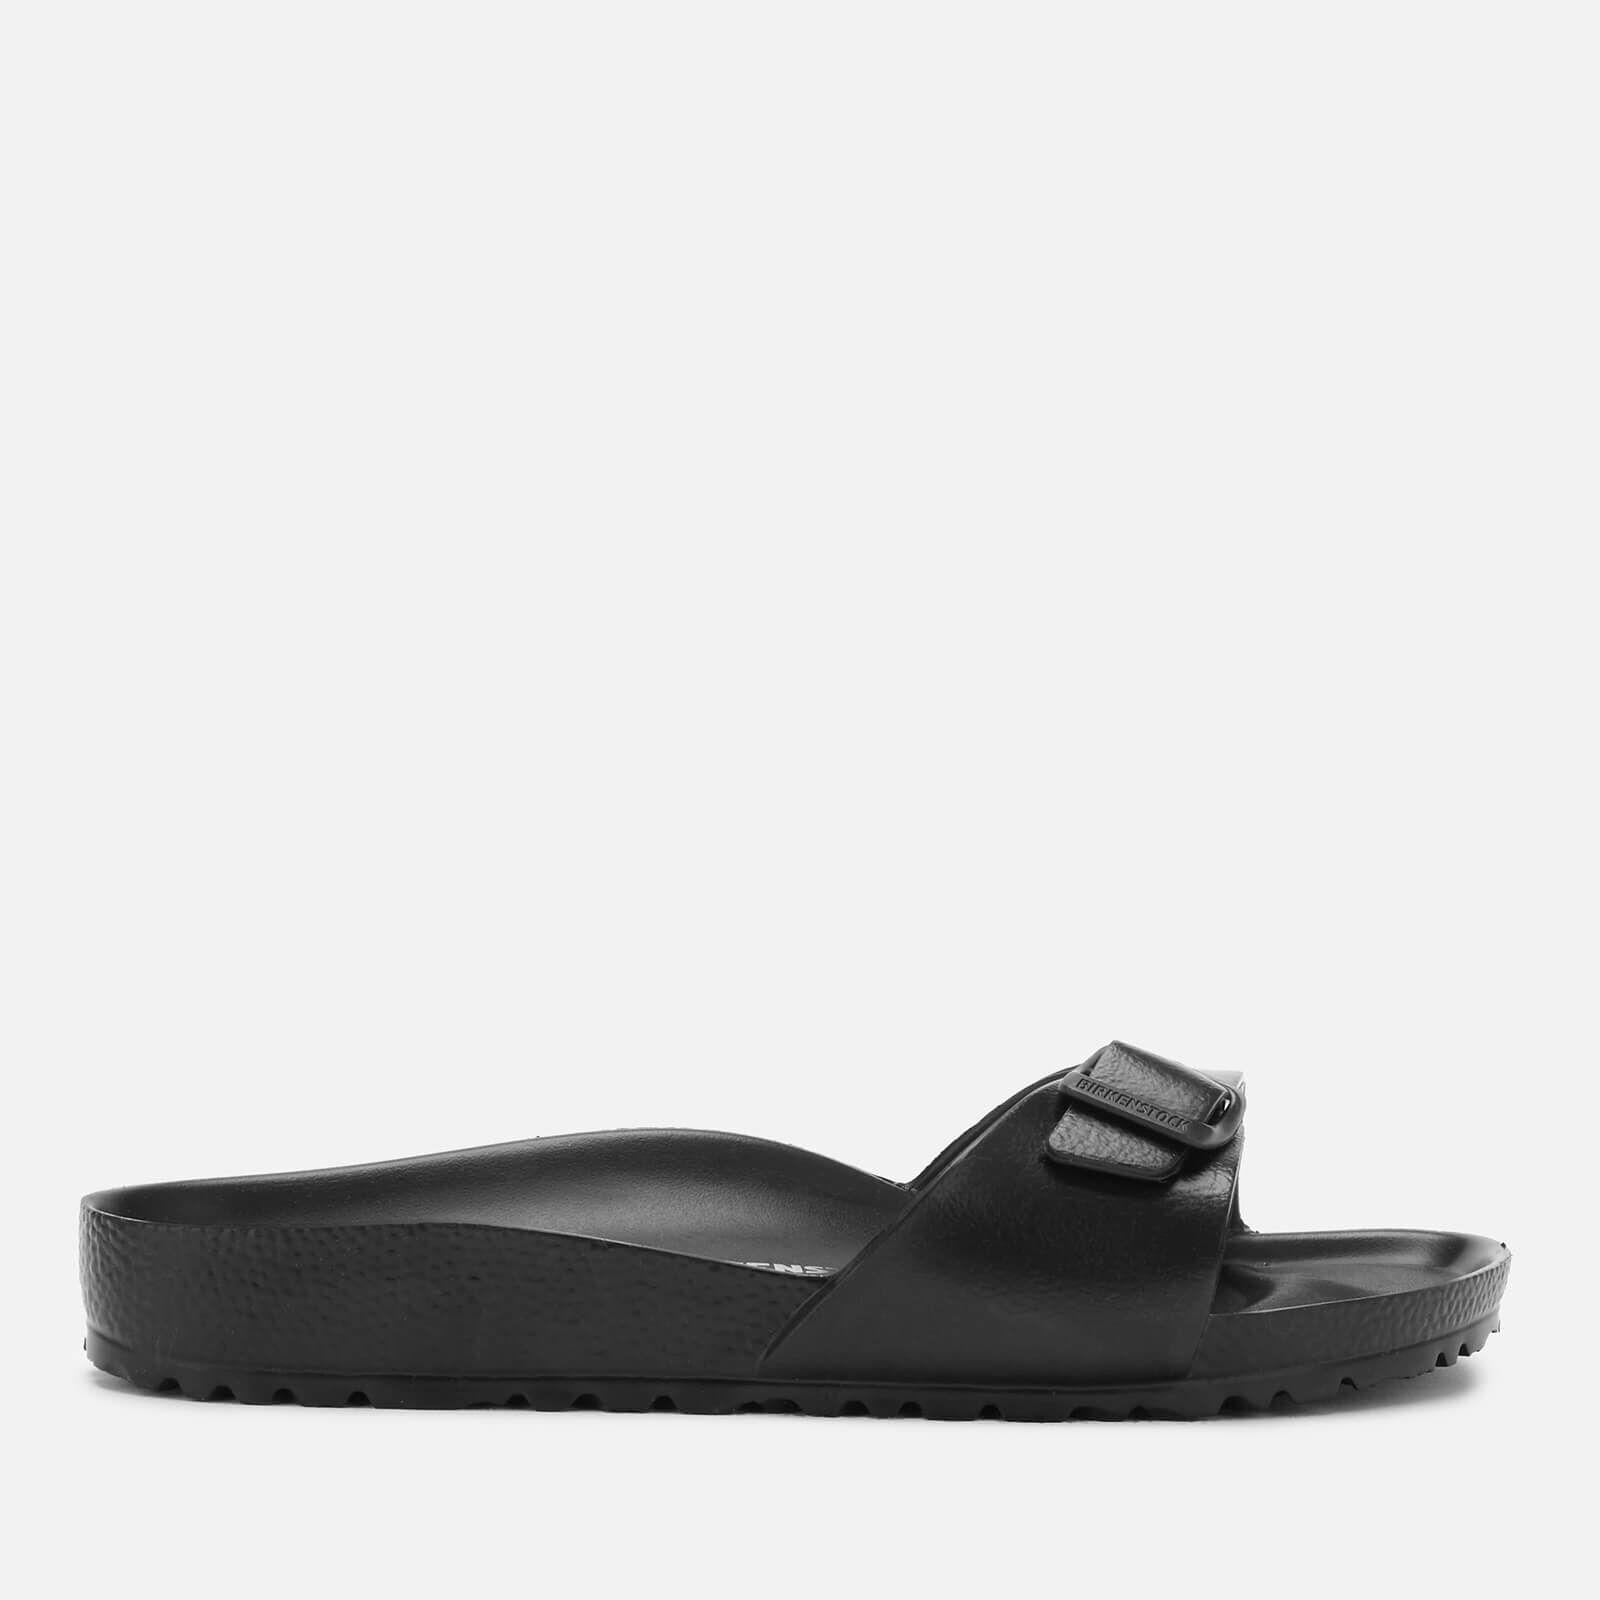 Birkenstock Women's Madrid Eva Single Strap Sandals - Black - EU 39/UK 5.5